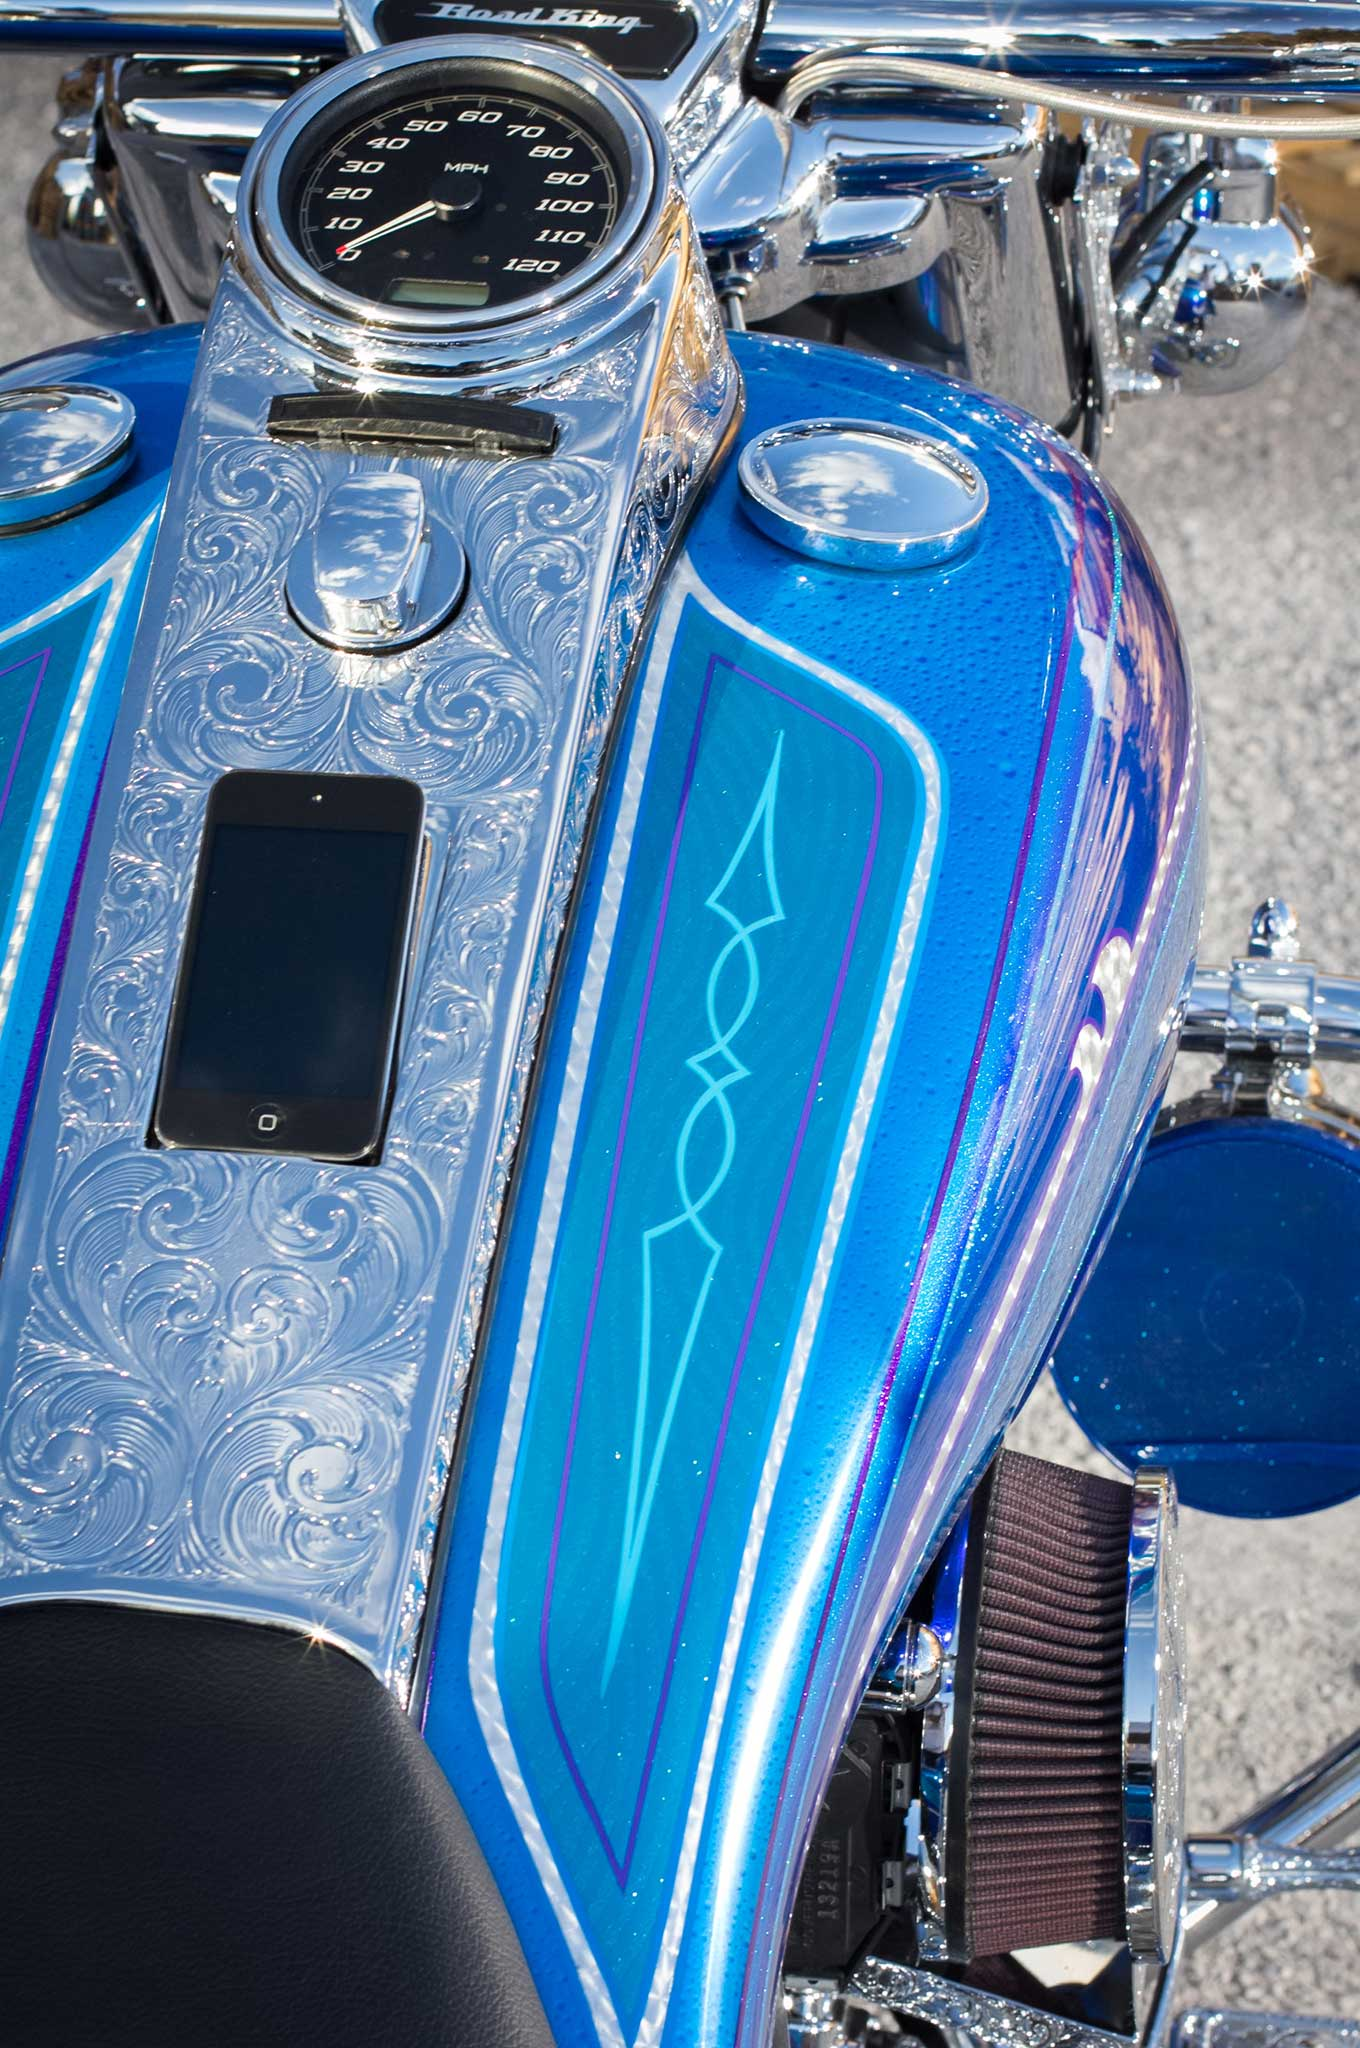 Drive A Tank >> 2014 Harley-Davidson Road King - Show Winner